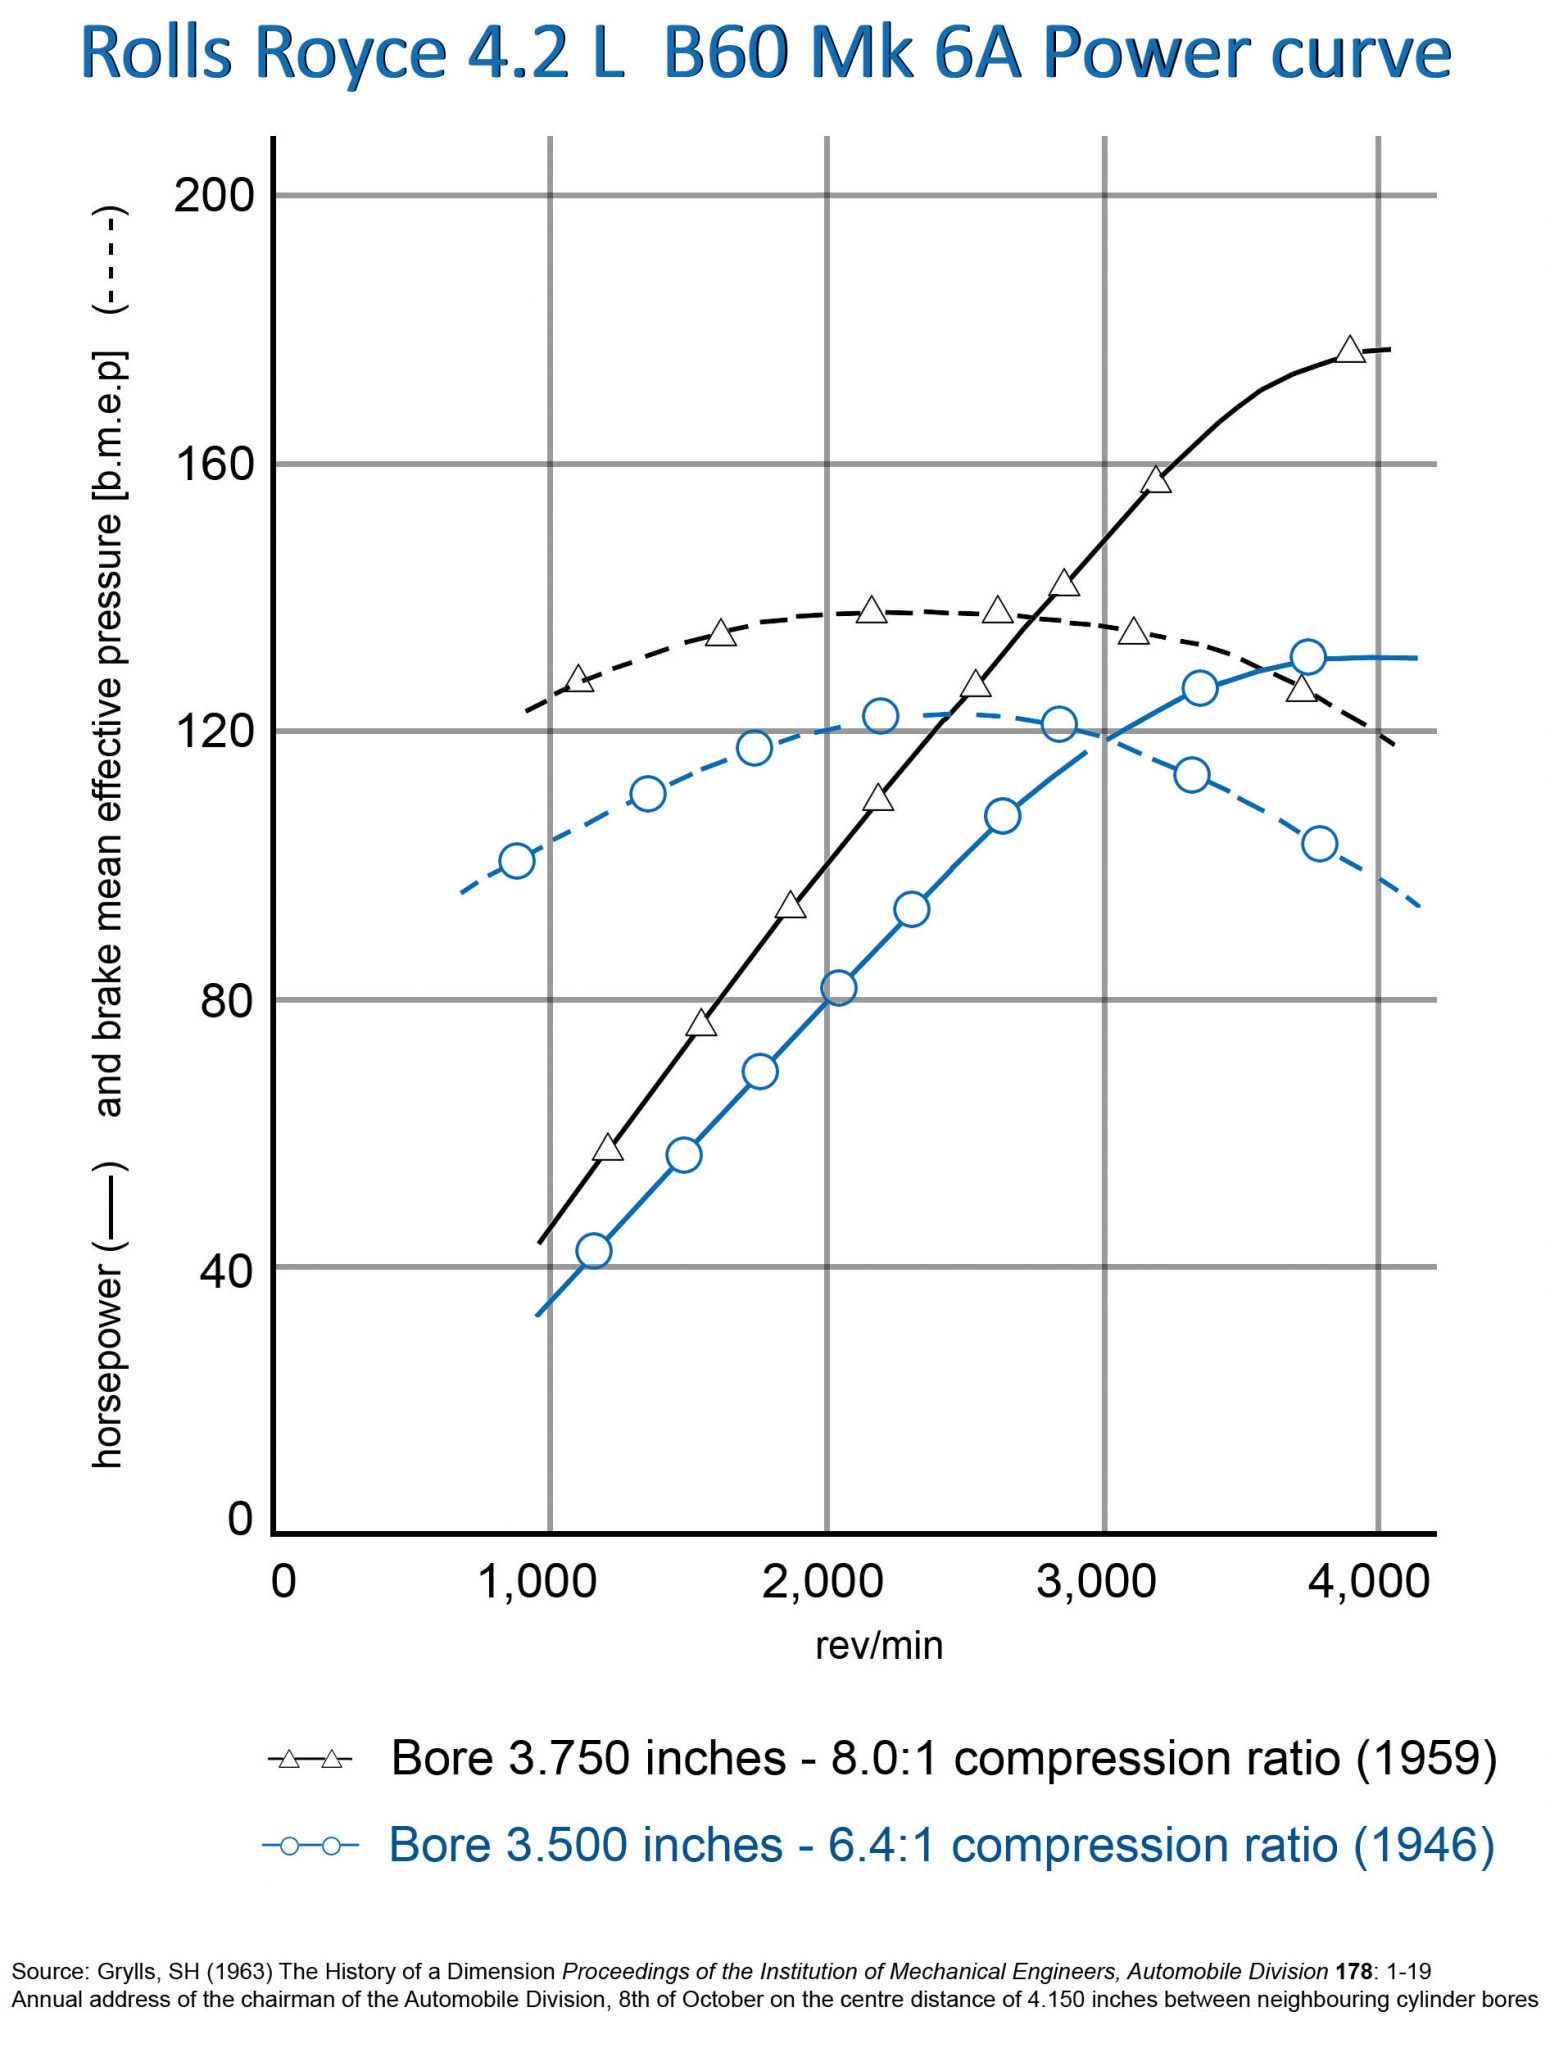 B60 engine power